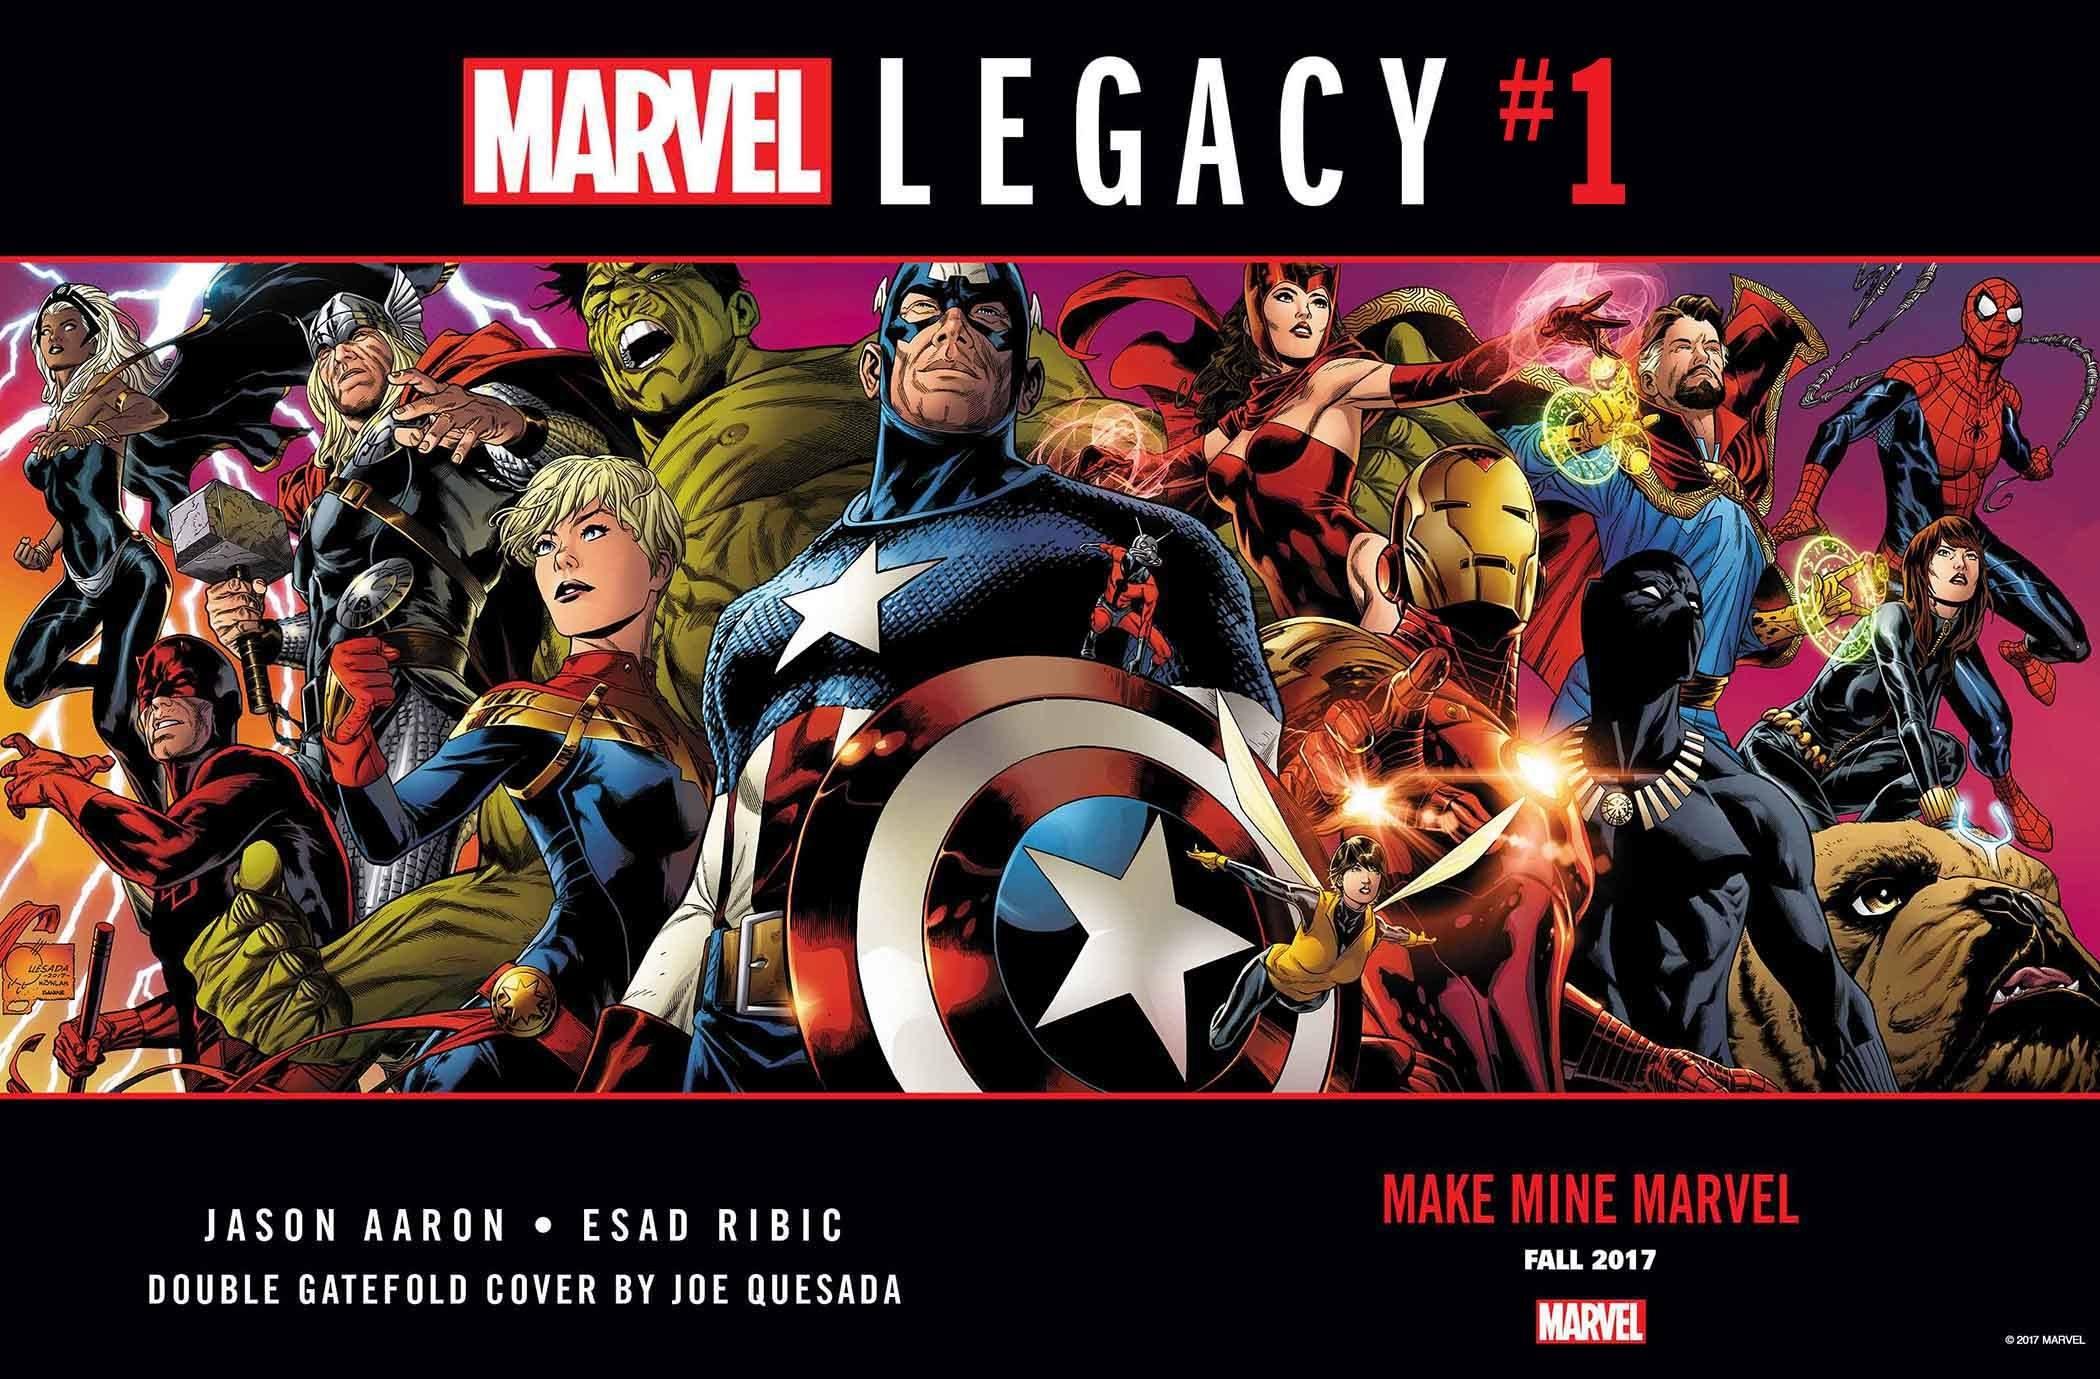 (c) Marvel